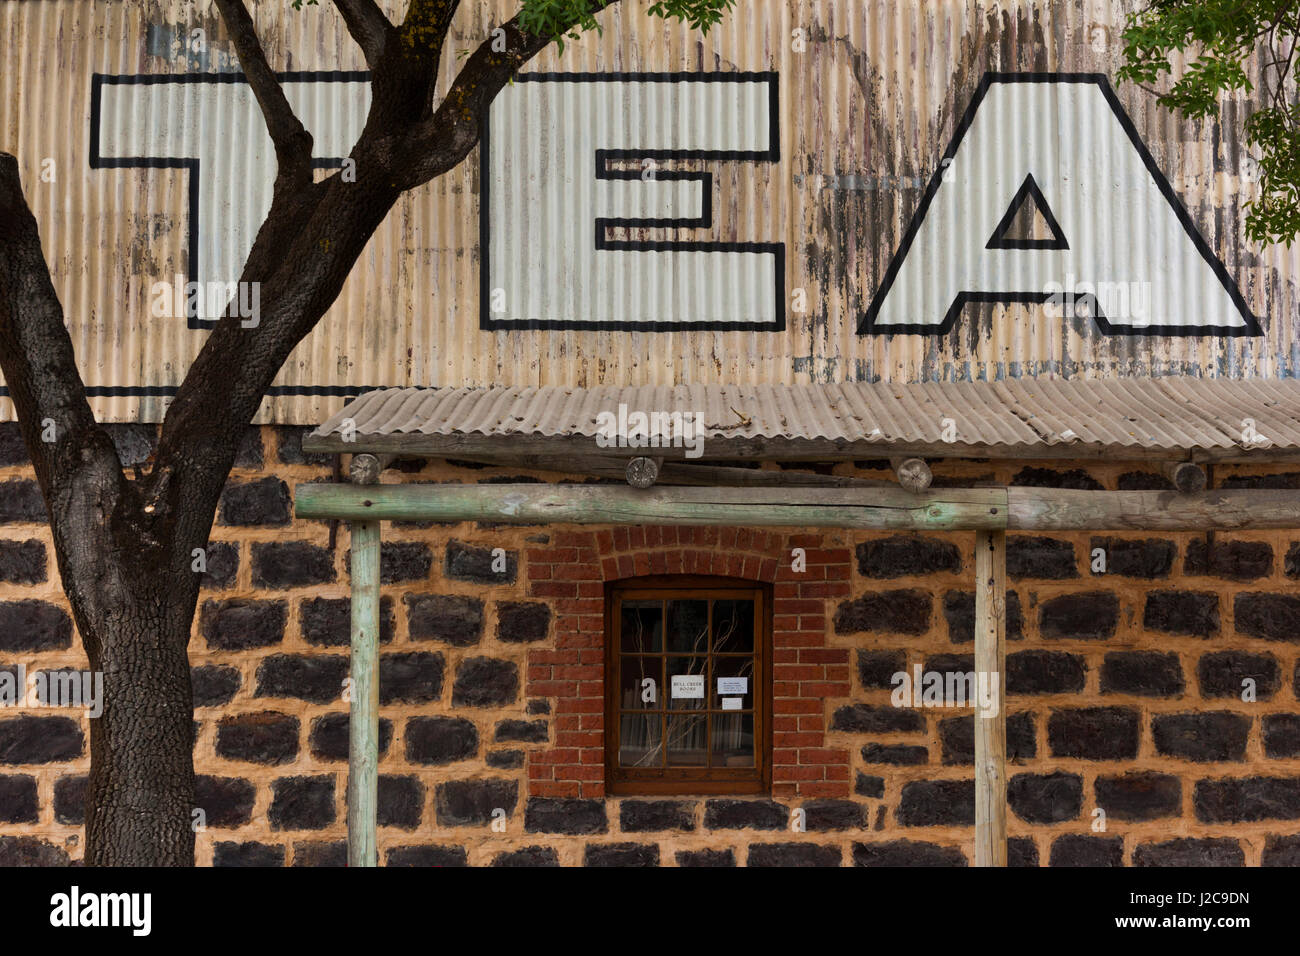 Australia, Barossa Valley, Tanunda, Nosh Cafe, exterior - Stock Image